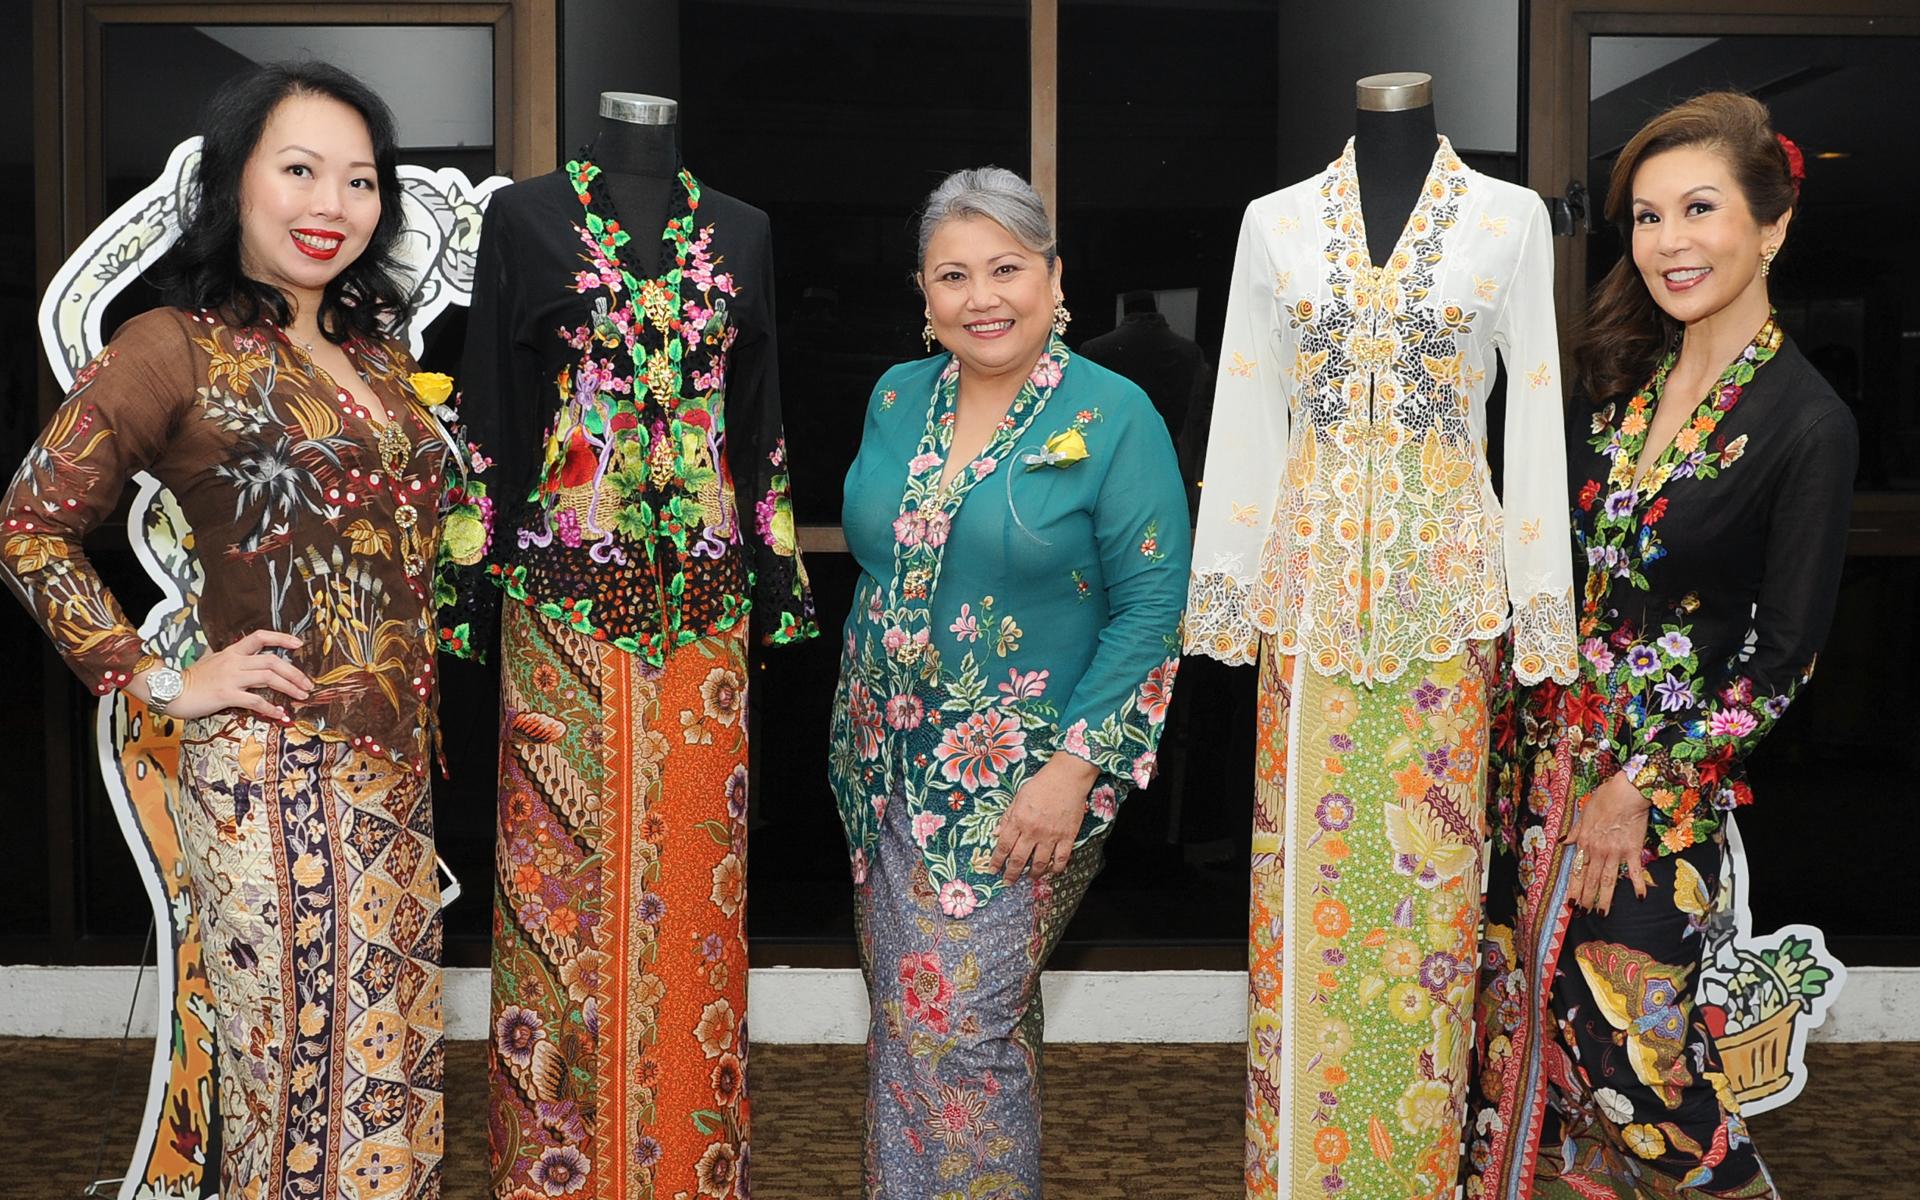 Linda Lim, Kessy Theseira and Vivienne Lee